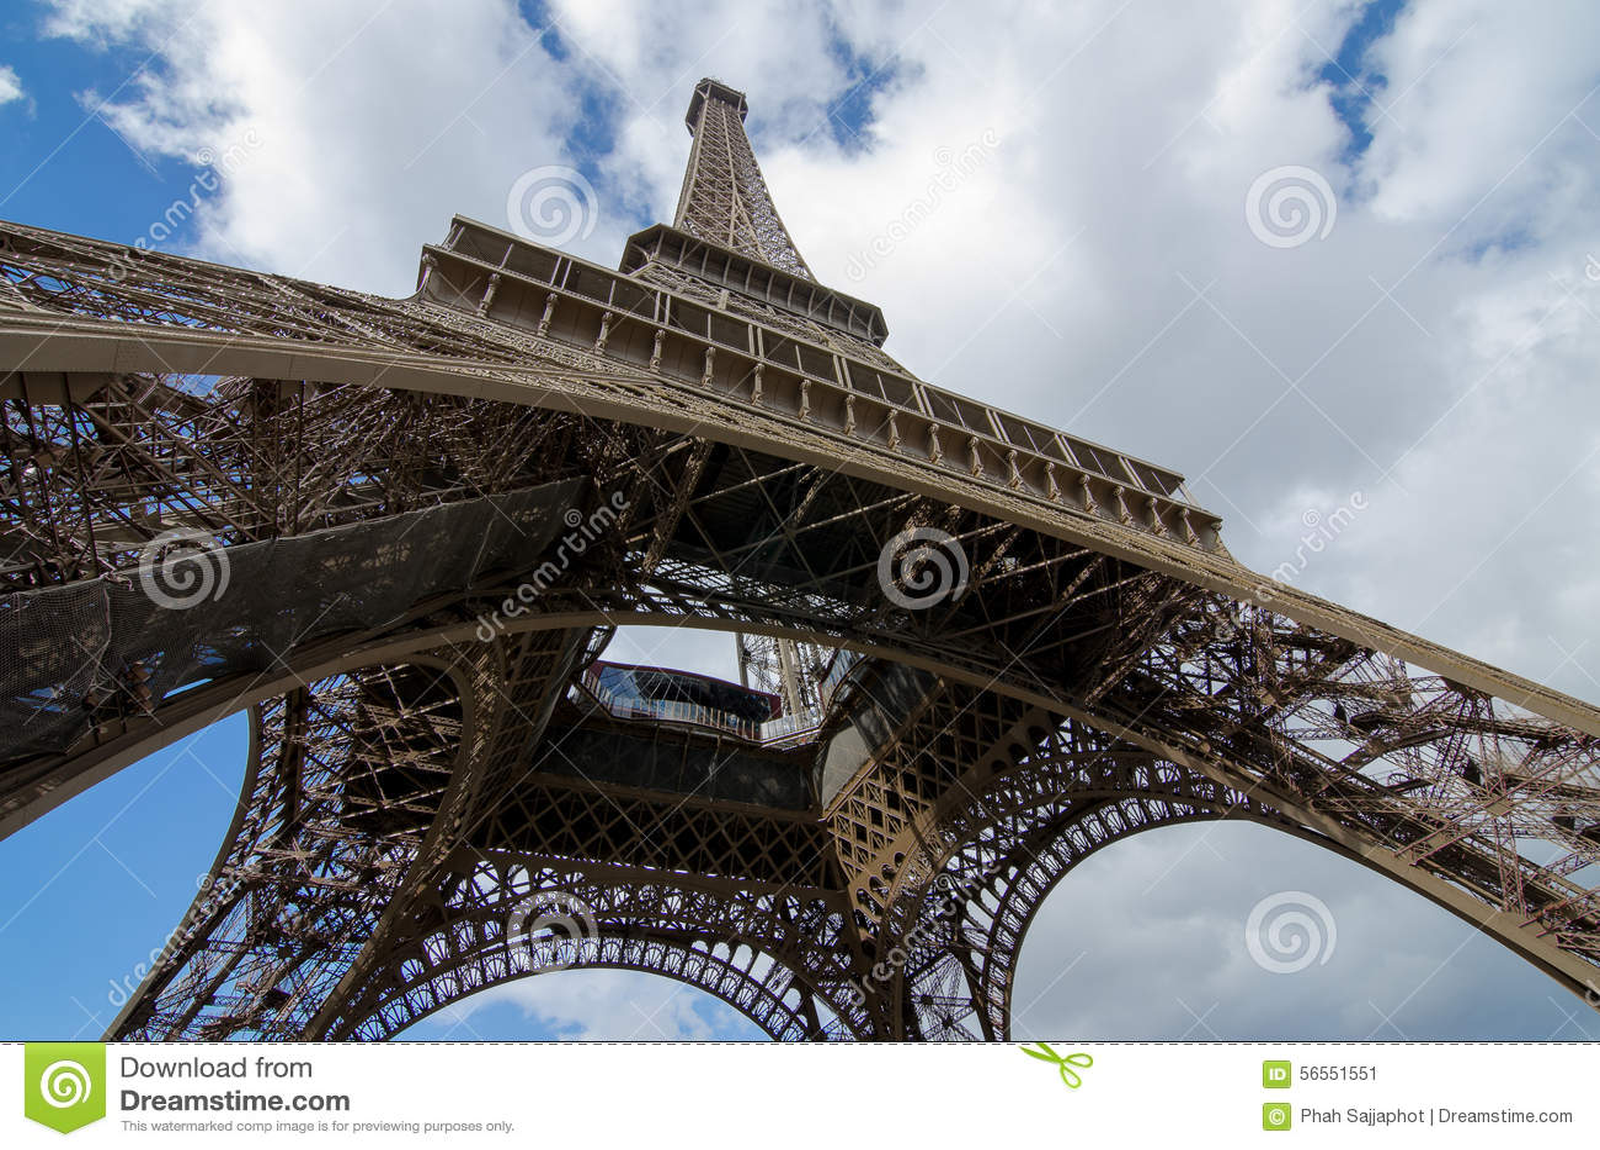 Download Κάτω από το μεγάλο πύργο του Άιφελ Στοκ Εικόνα - εικόνα από ορόσημο, αρχιτεκτονικής: 56551551